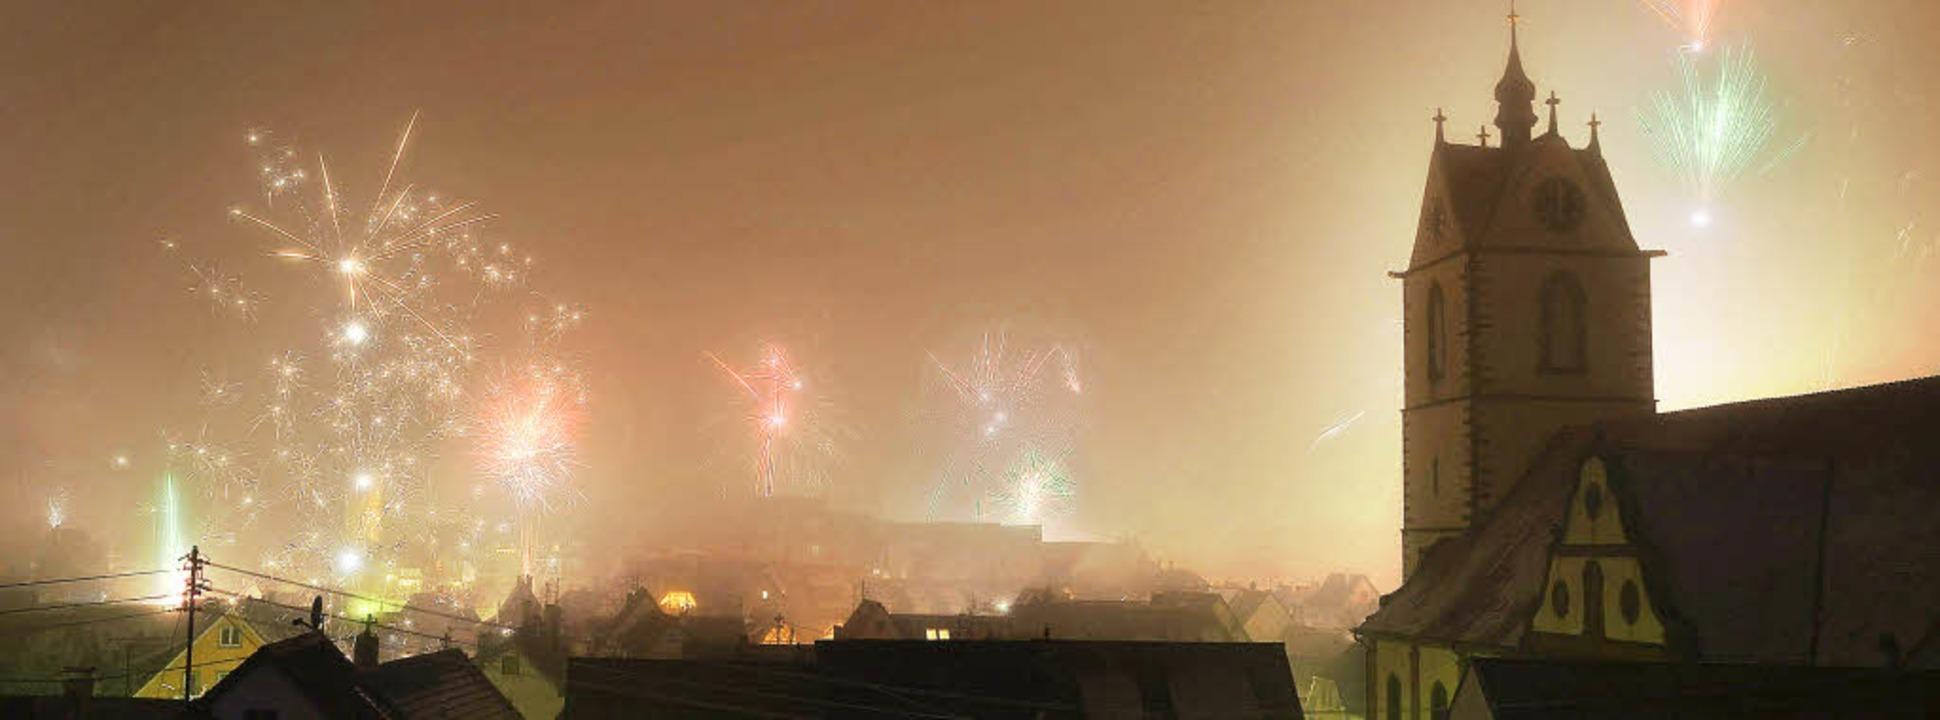 Endingen. Am Nachthimmel  sehen die Silvesterraketen gut aus.  | Foto: Roland Vitt